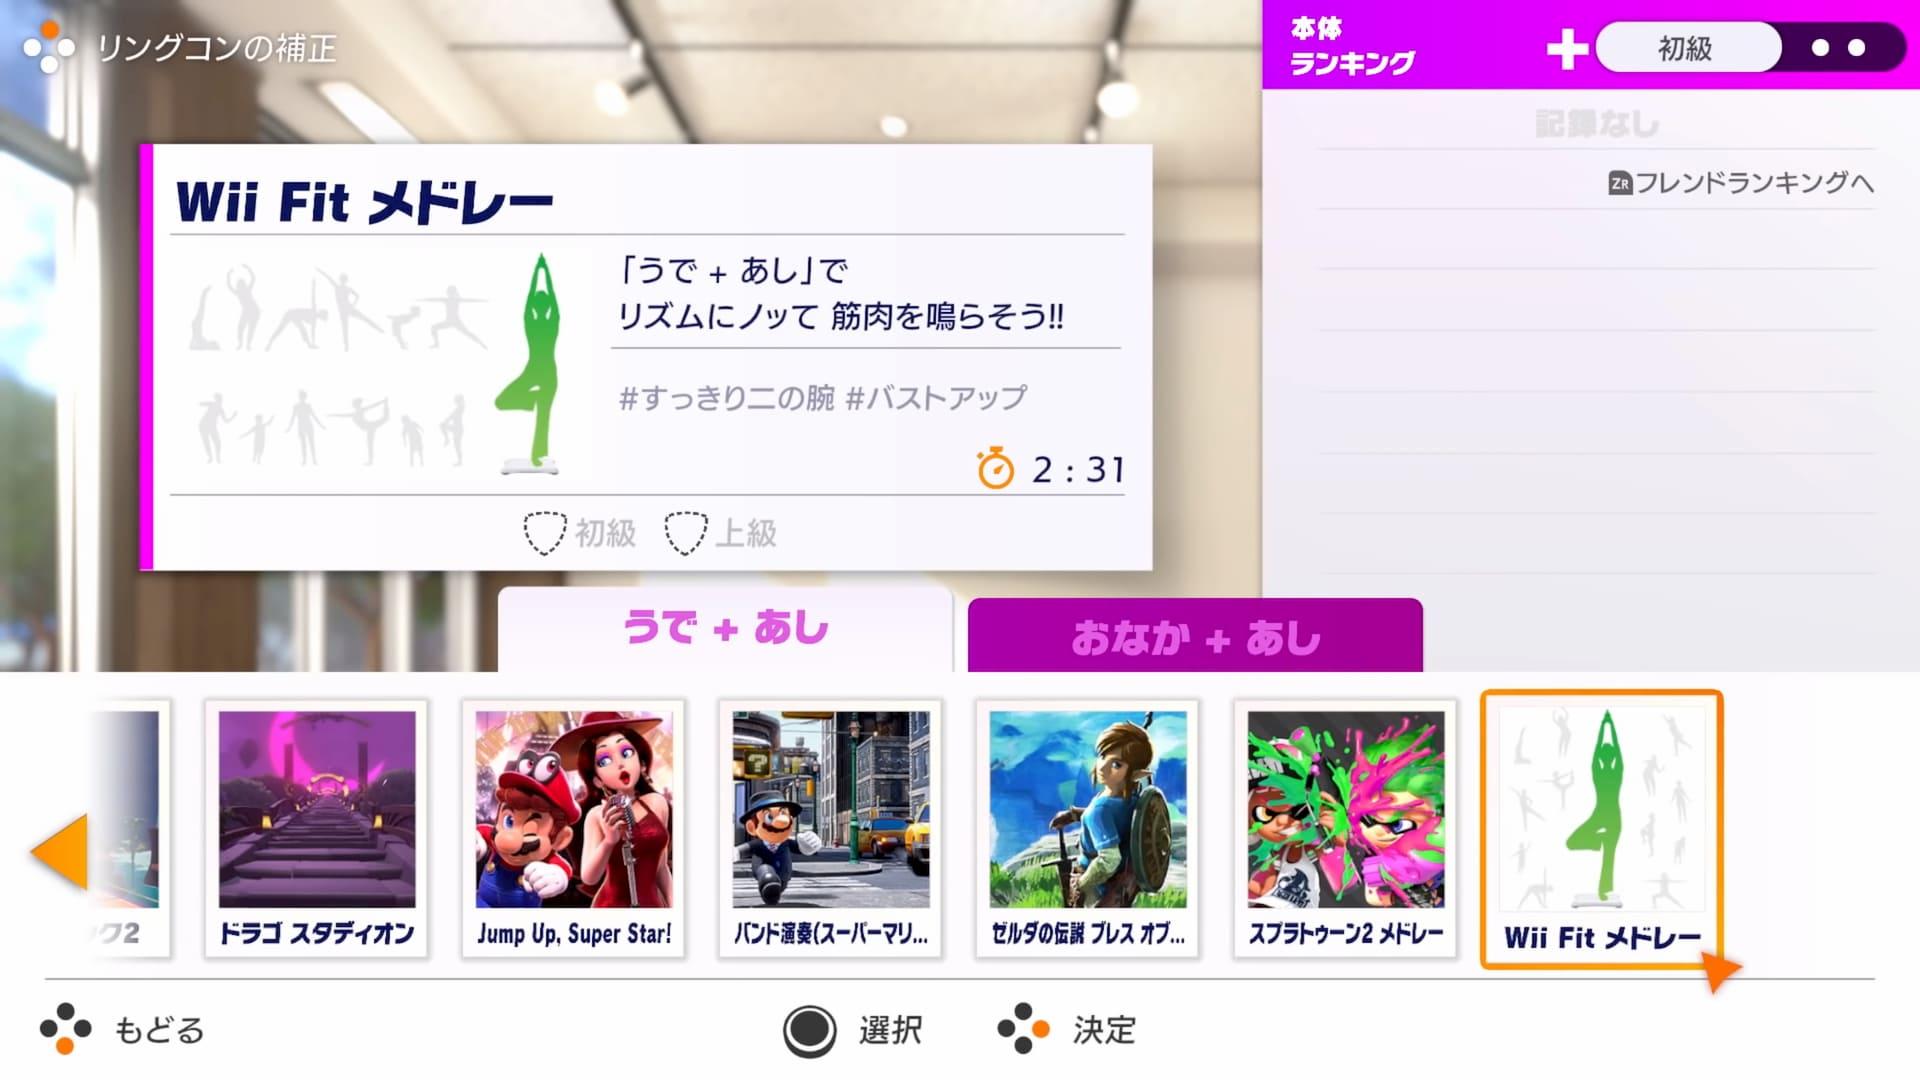 楽曲、難易度、プレイ方式選択画面